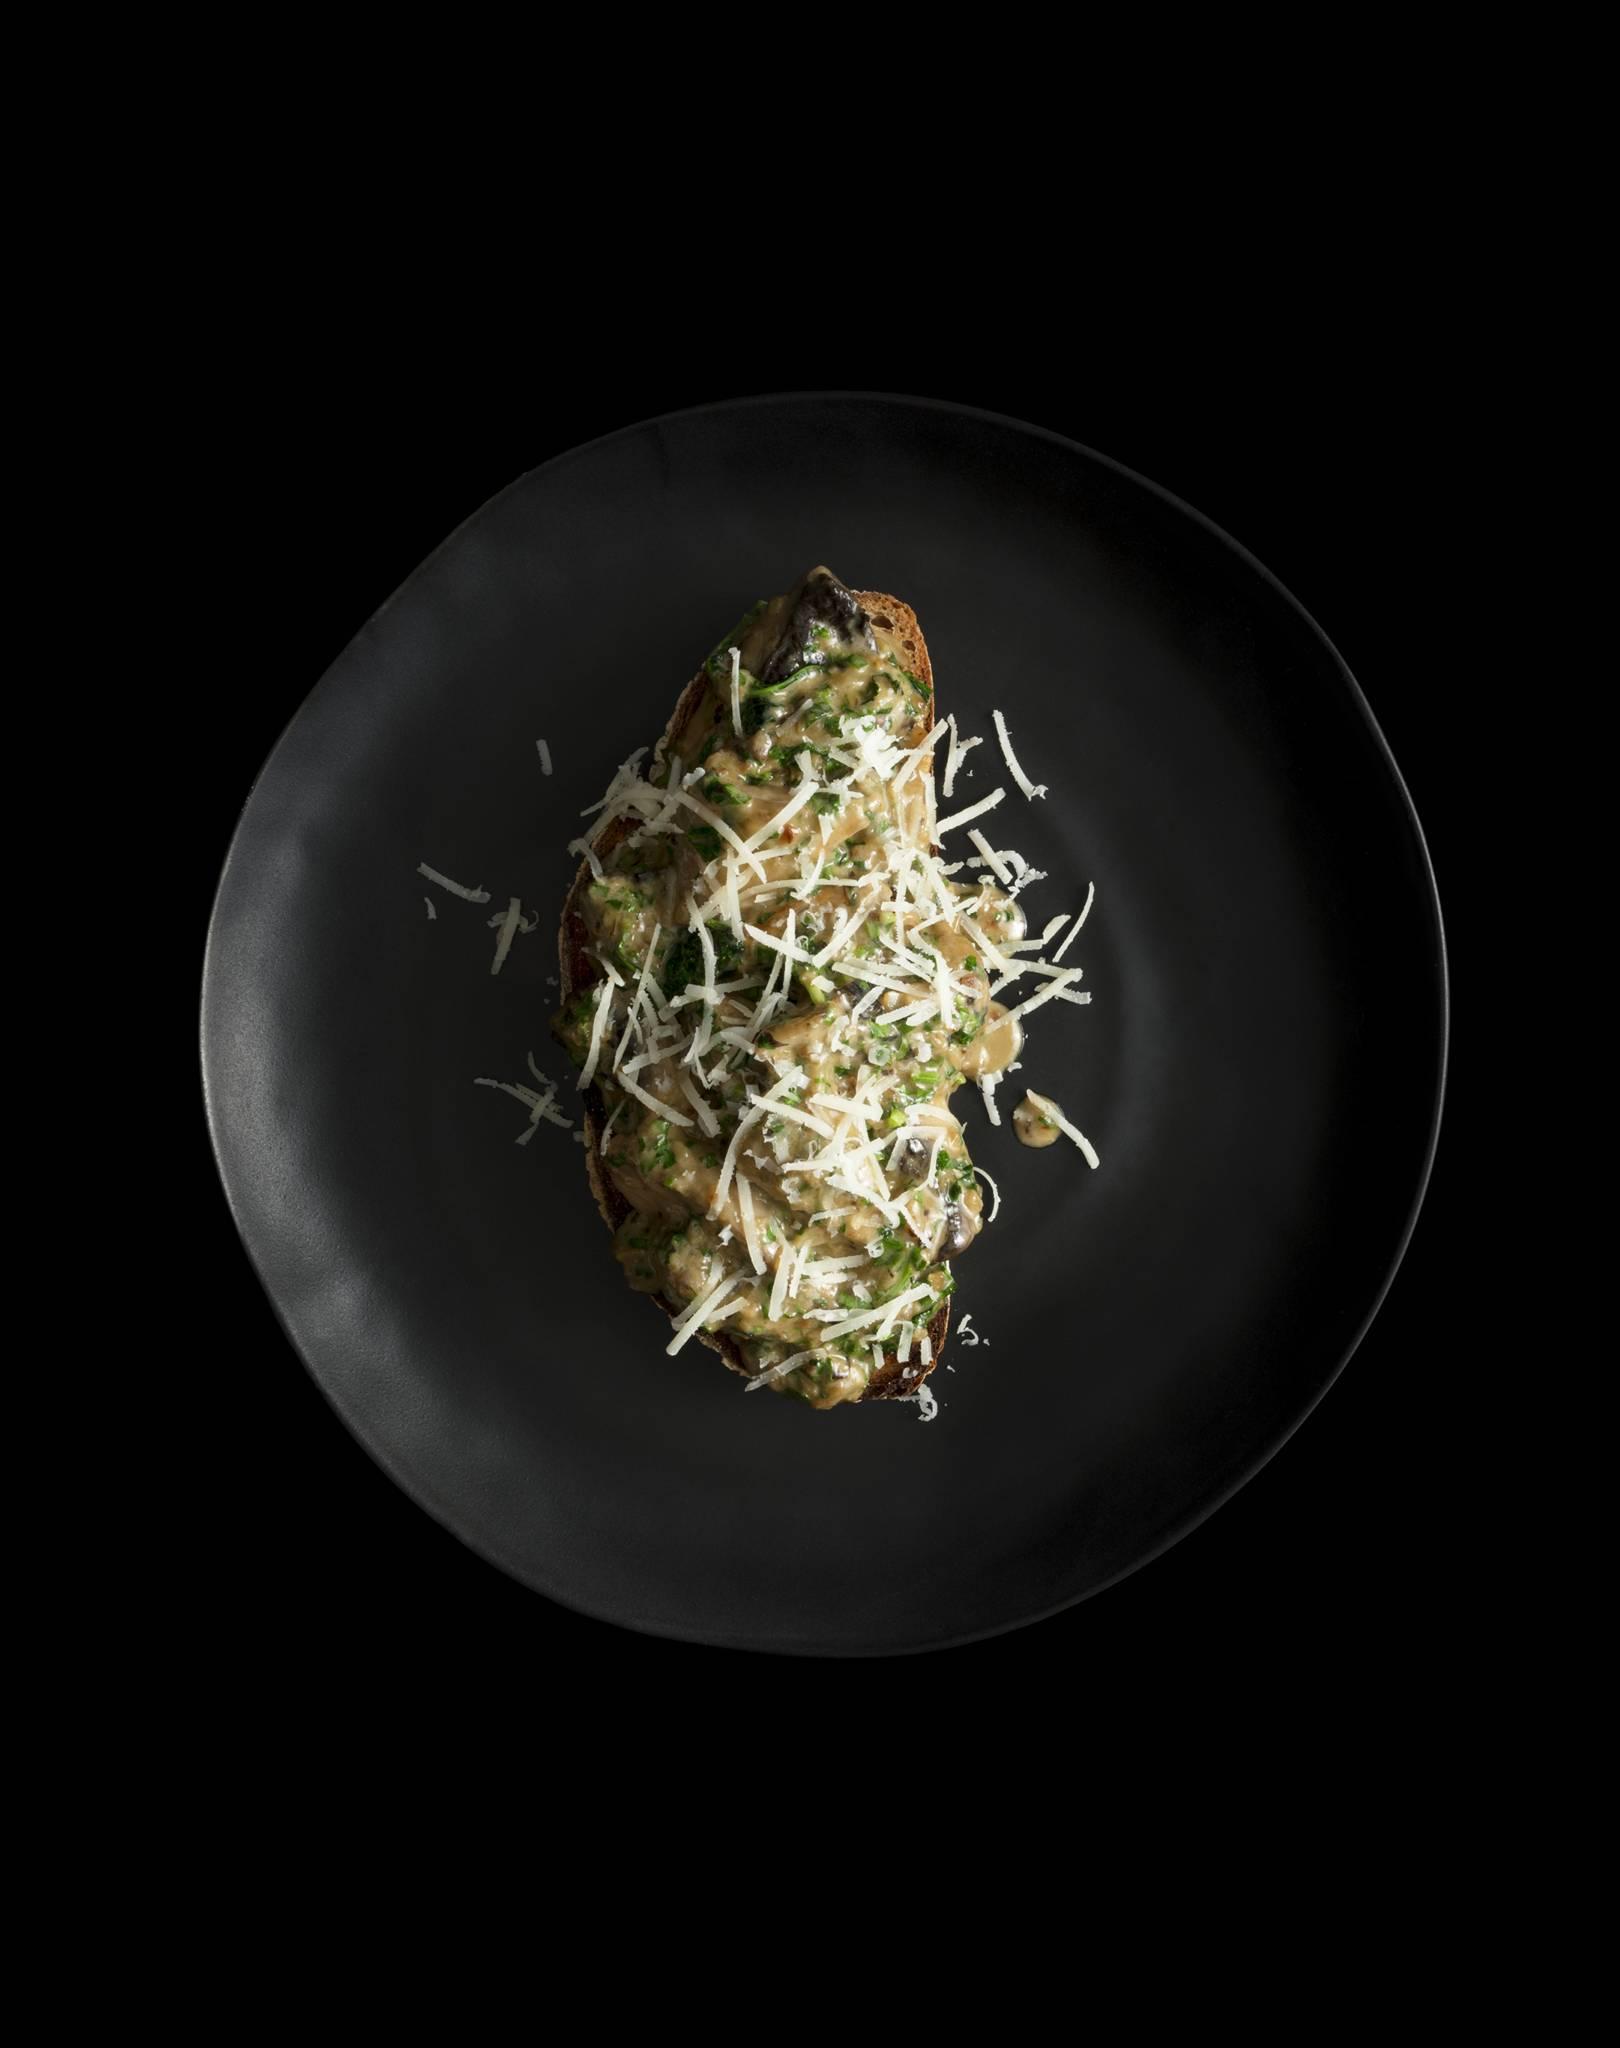 Tom Kerridge's St George's mushrooms, garlic and parsley on sourdough toast